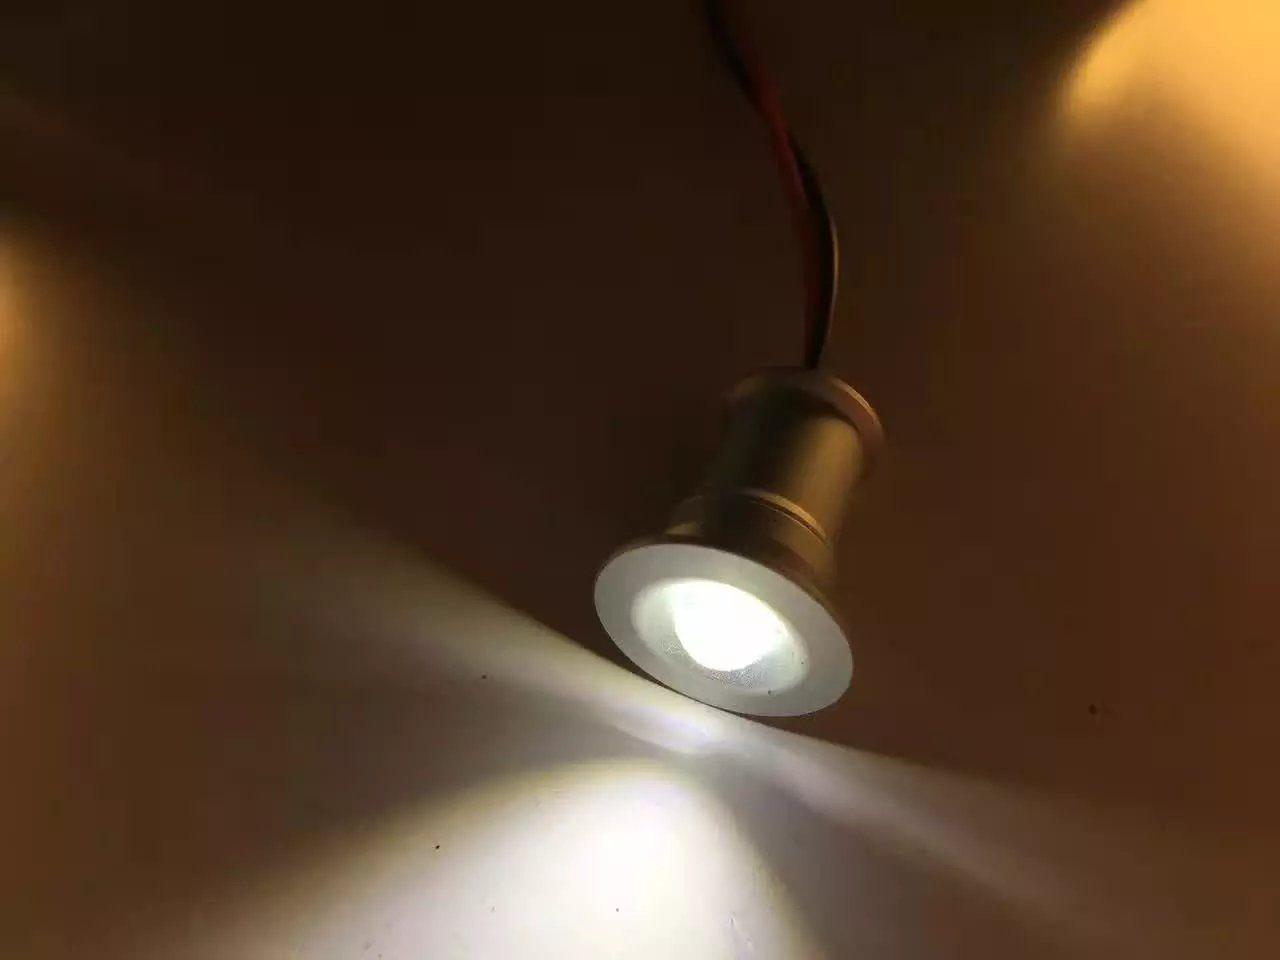 Mini led spotlight 1w recessed under cabinet light showcase tv rooms descubre ideas sobre debajo del gabinete mini led spotlight 1w recessed under cabinet light aloadofball Images